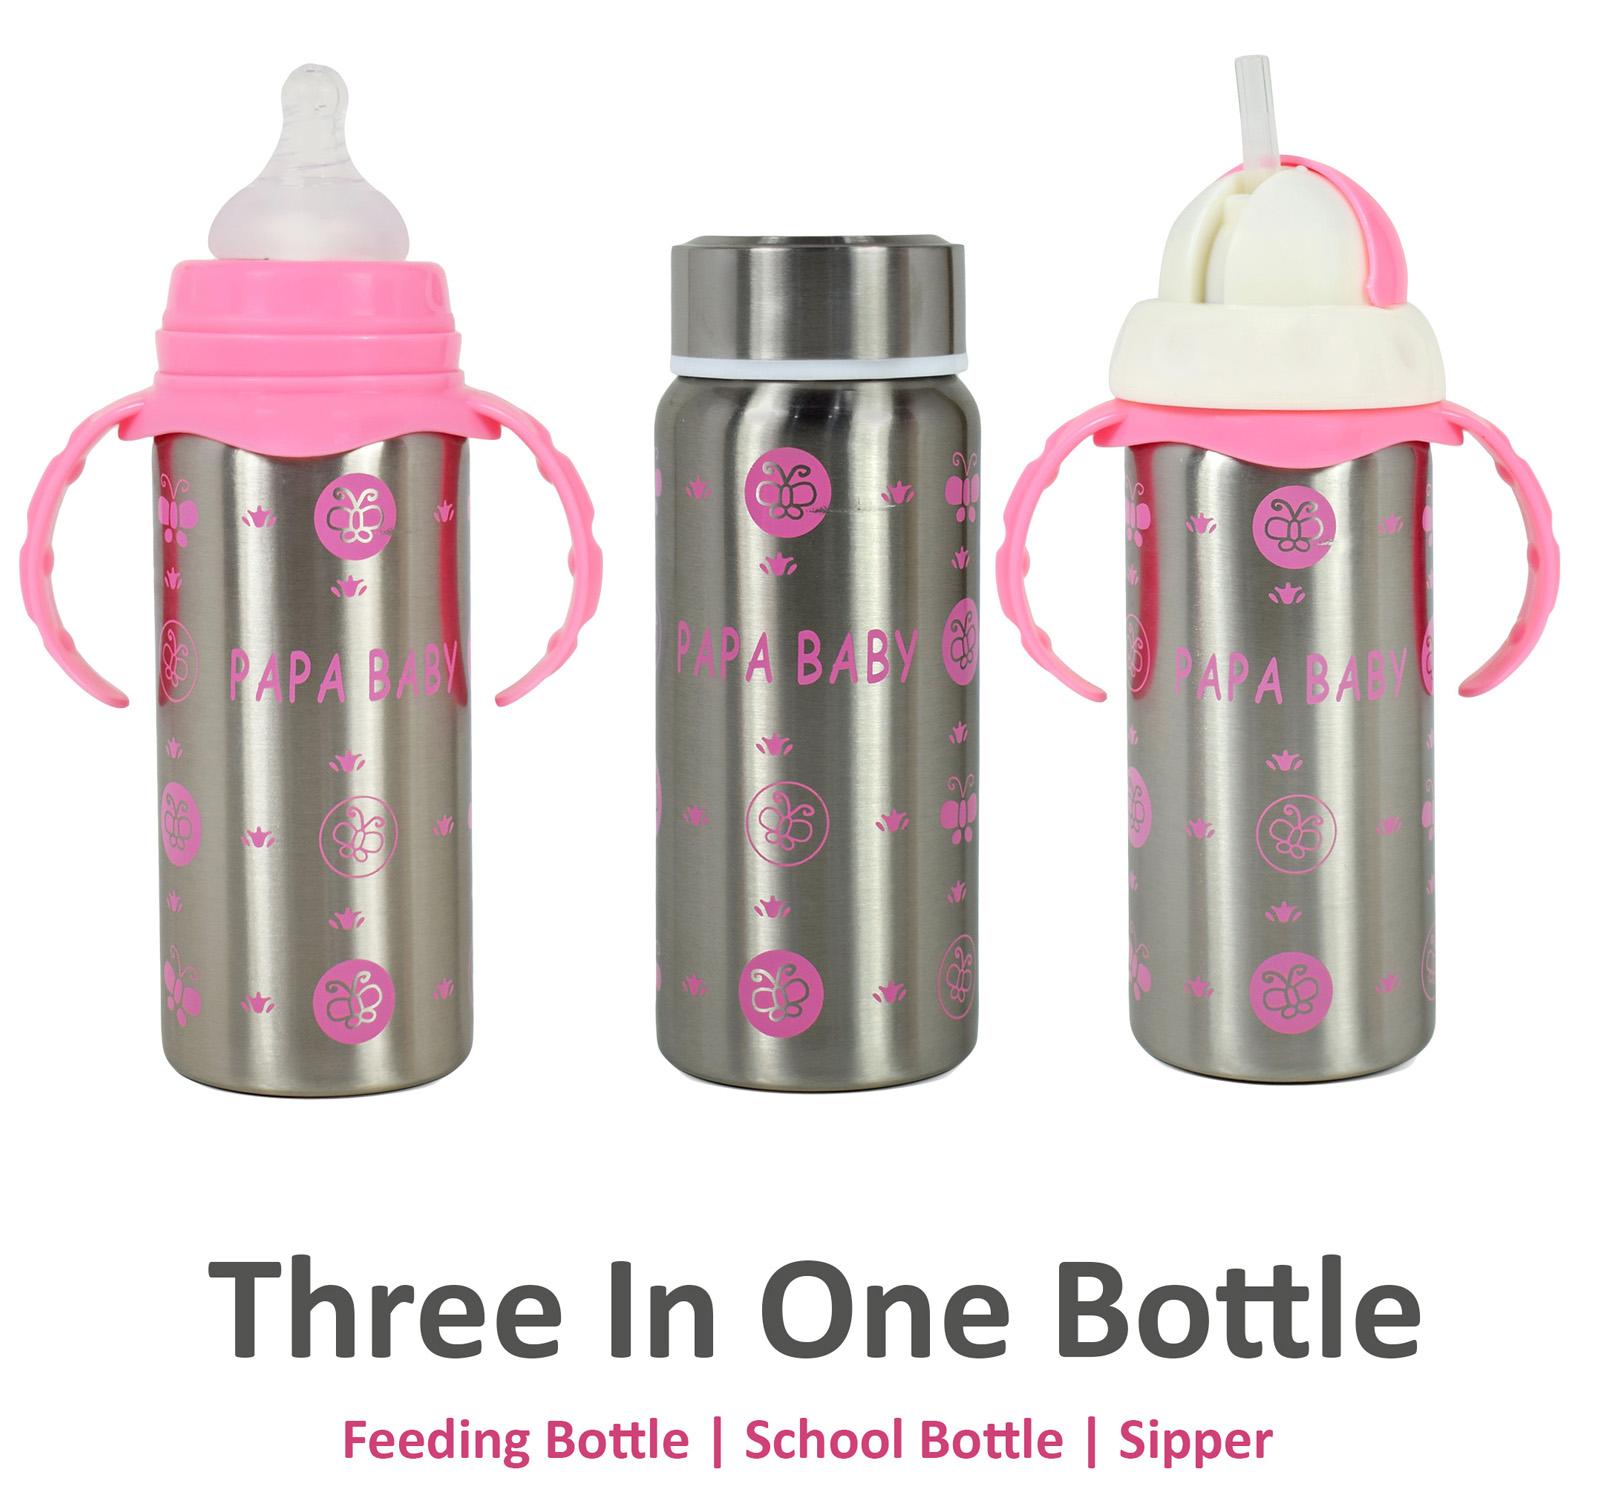 Papa Baby Multipurposable Steel Feeding Bottle - Pink-0